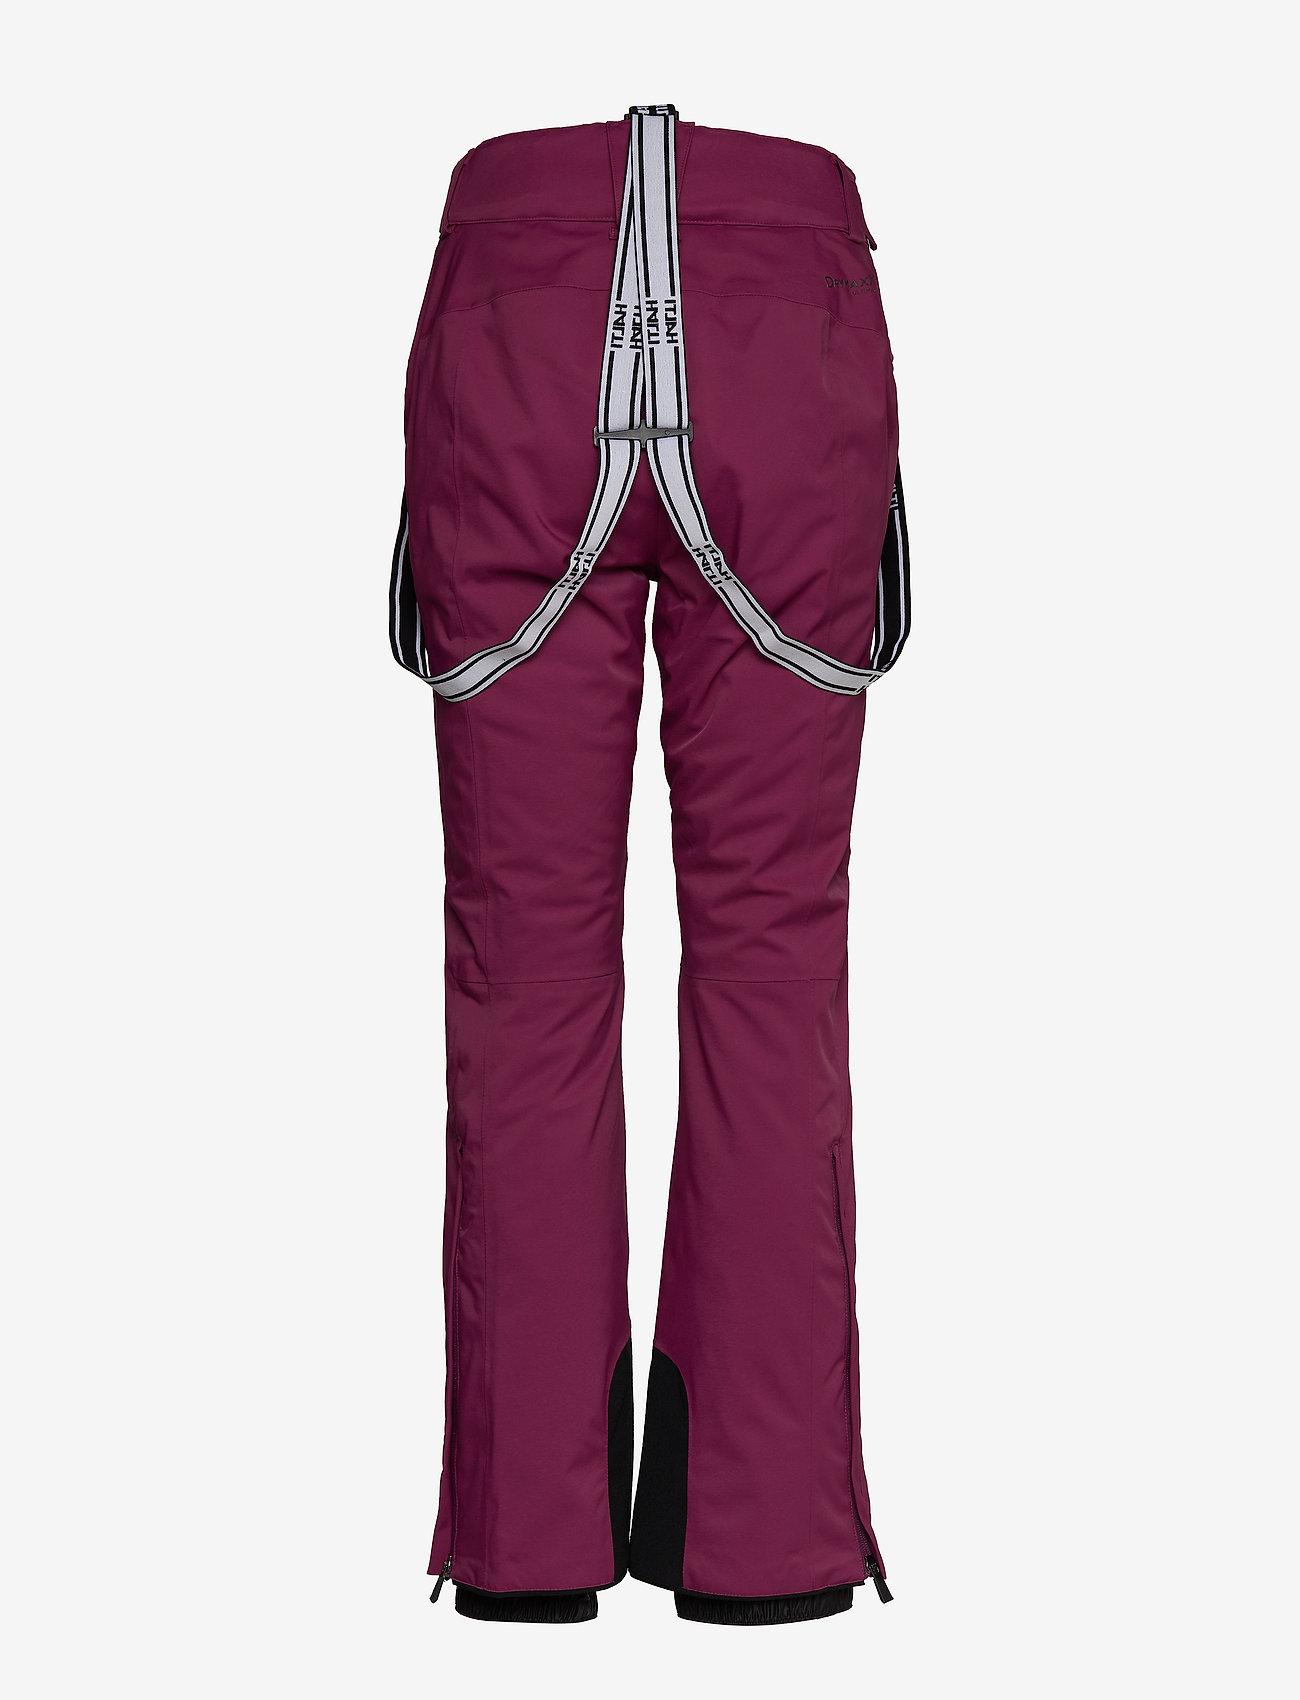 Halti - Podium Women's DX Ski Pants - insulated pants - plum purple - 1